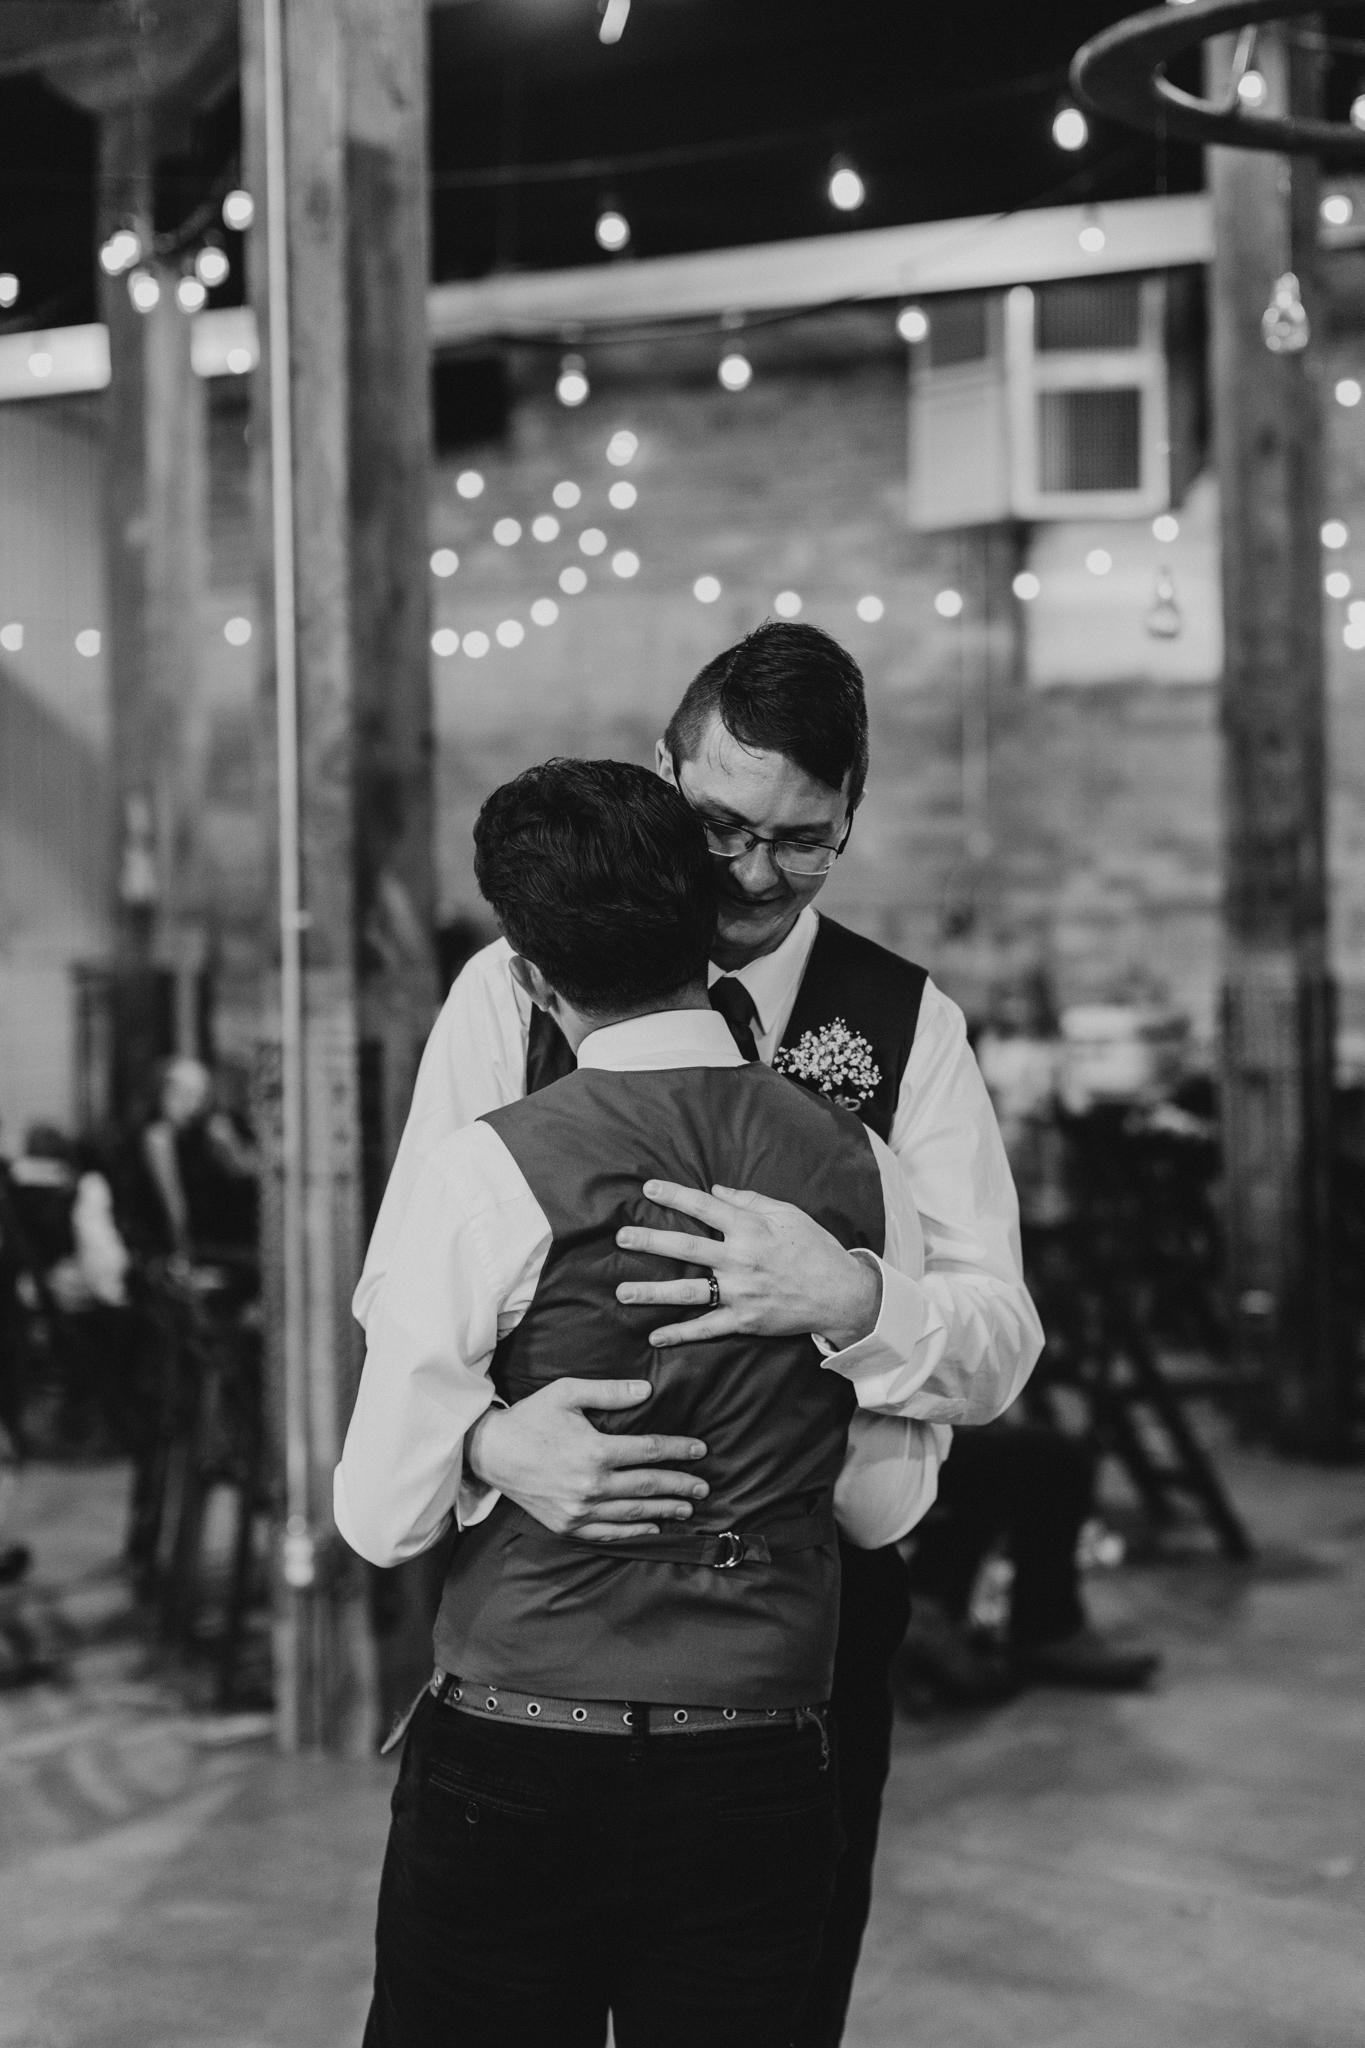 ryan.patrick.wedding-138.jpg